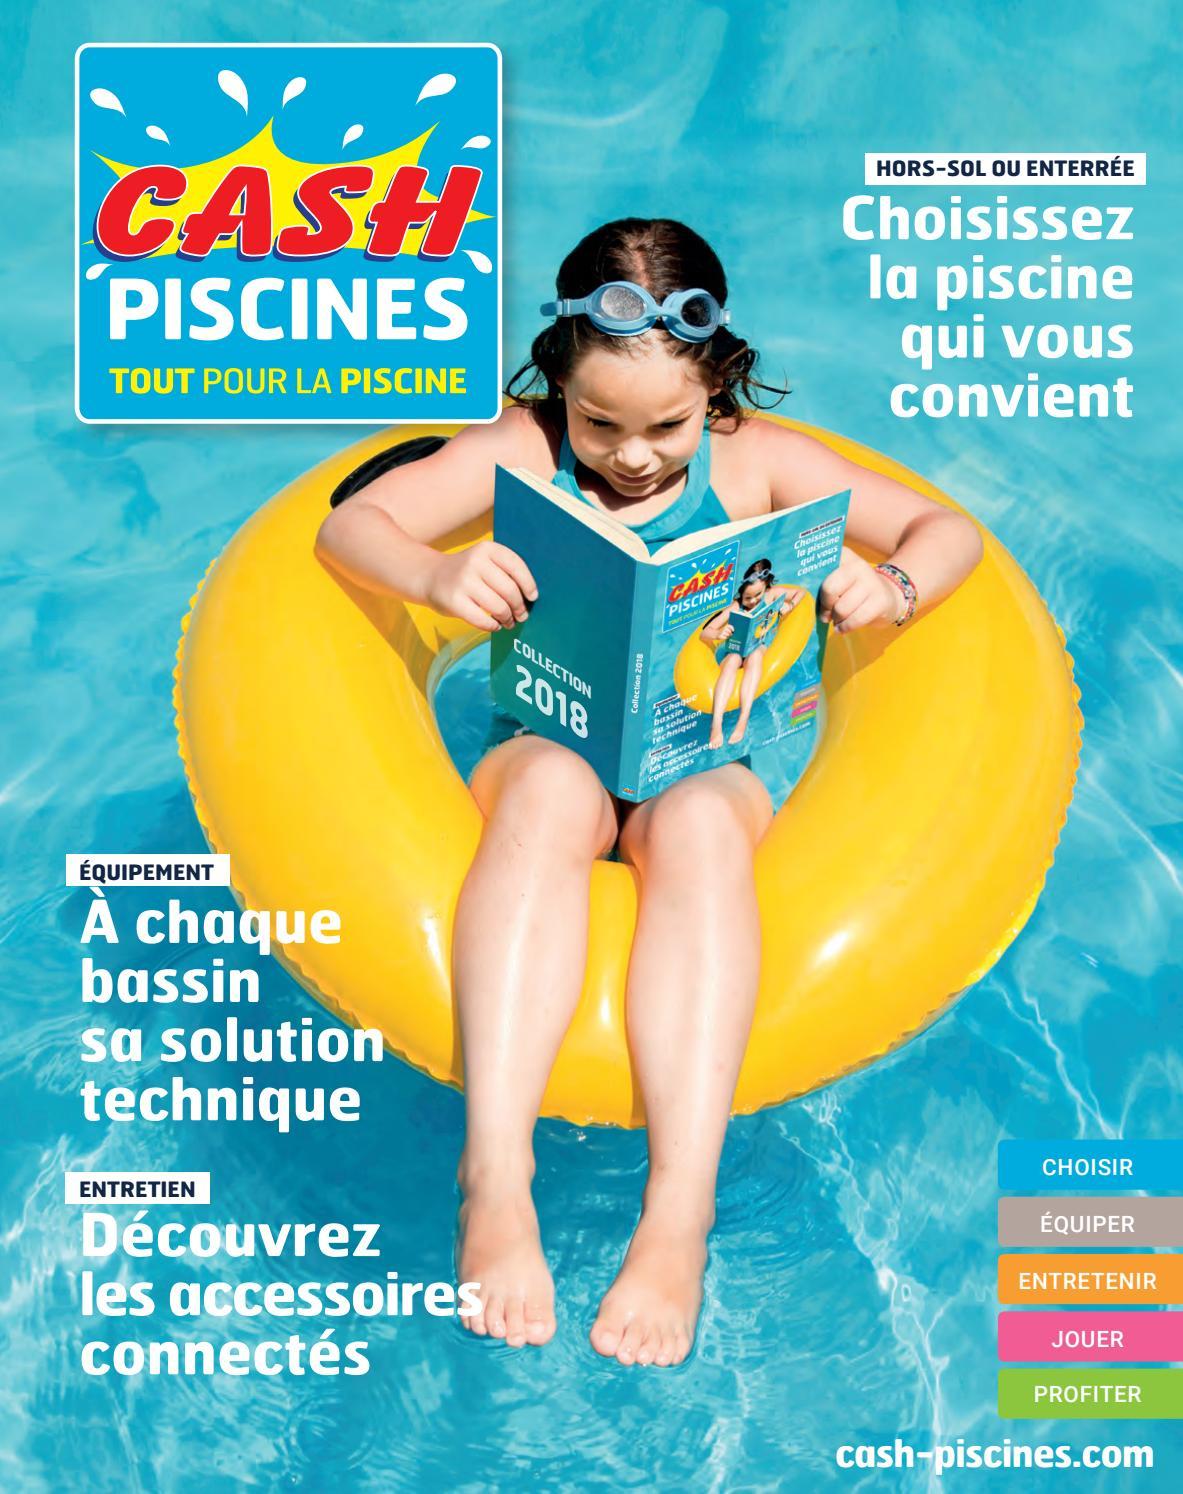 Catalogue Cash Piscine 2018 By Octave Octave - Issuu avec Cash Piscine Manosque